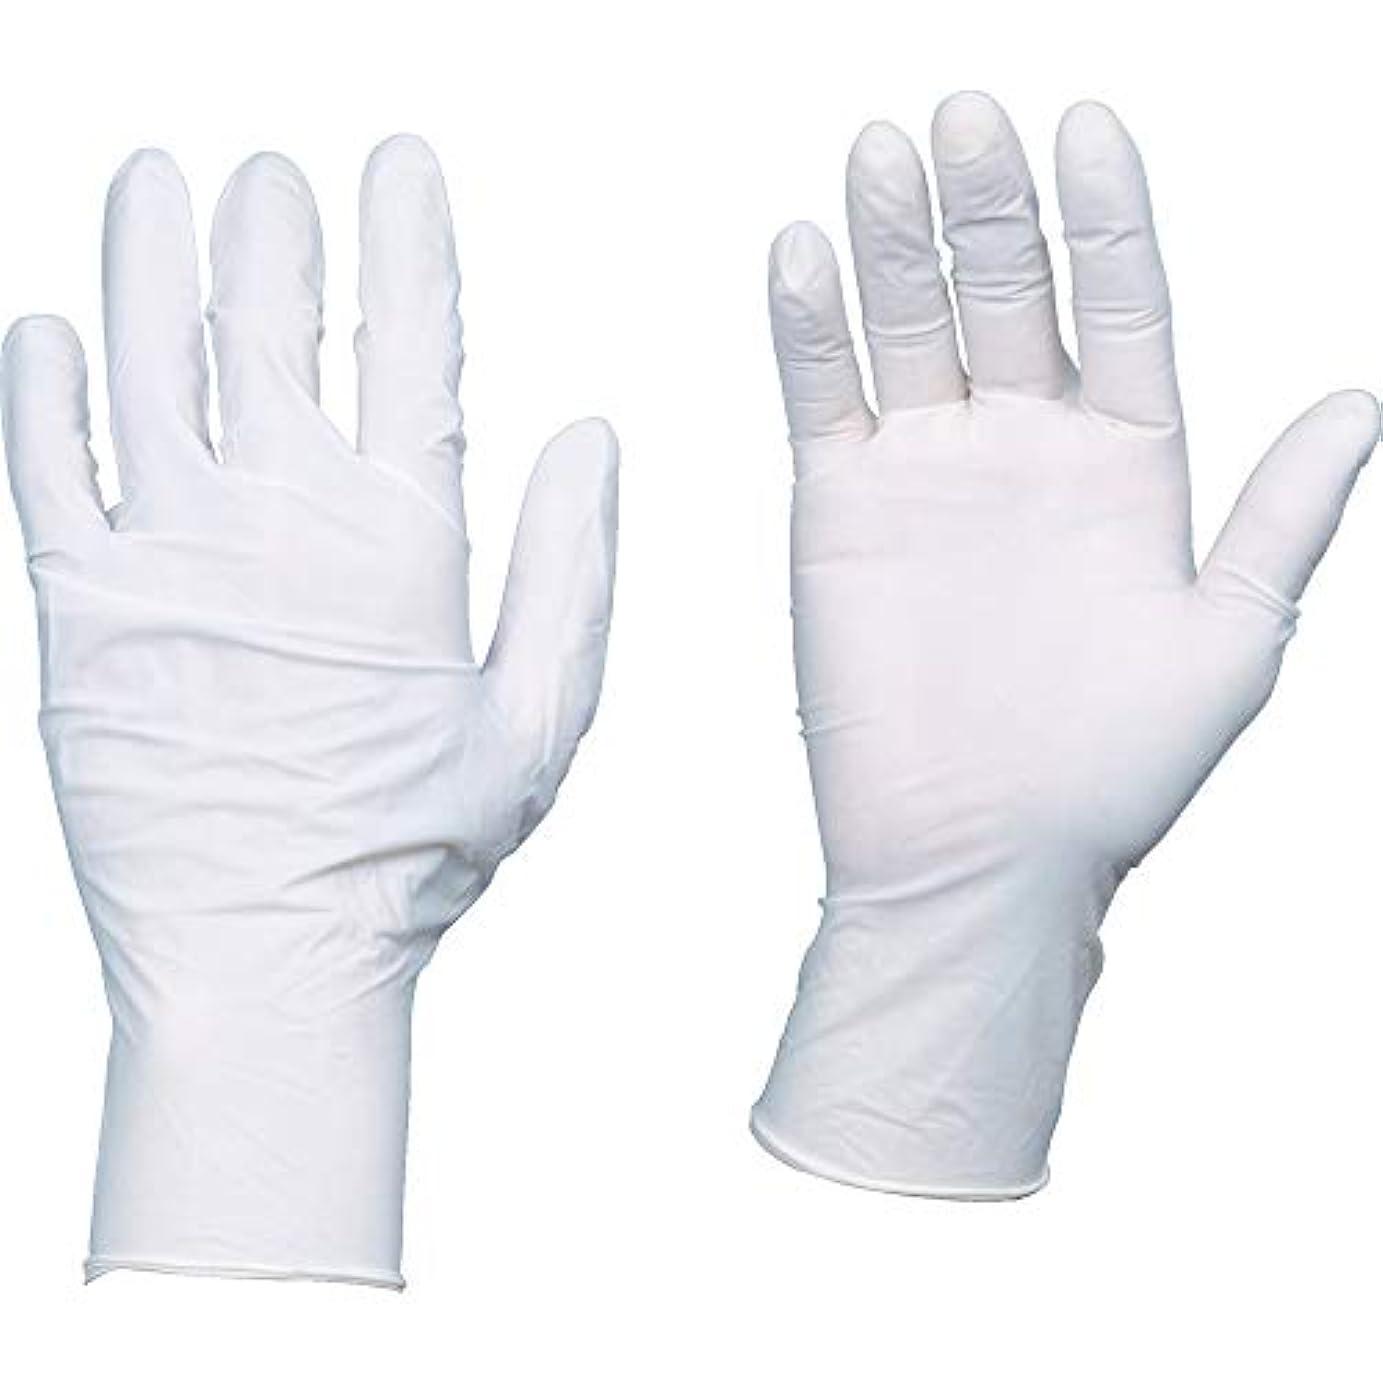 TRUSCO(トラスコ) 10箱入り 使い捨て天然ゴム手袋TGワーク 0.10 粉付白M TGPL10WM10C